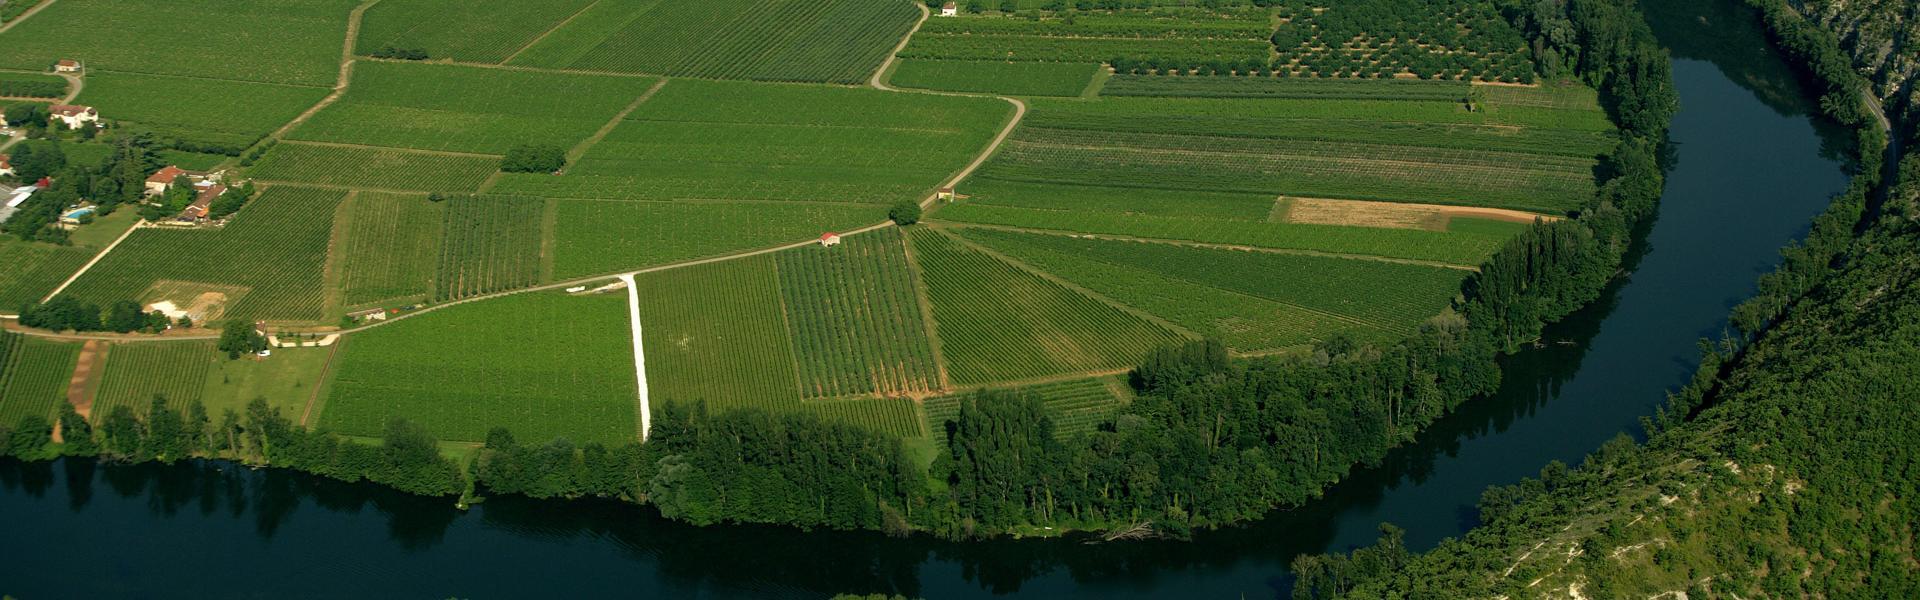 La vallée du Lot en aval de Cahors